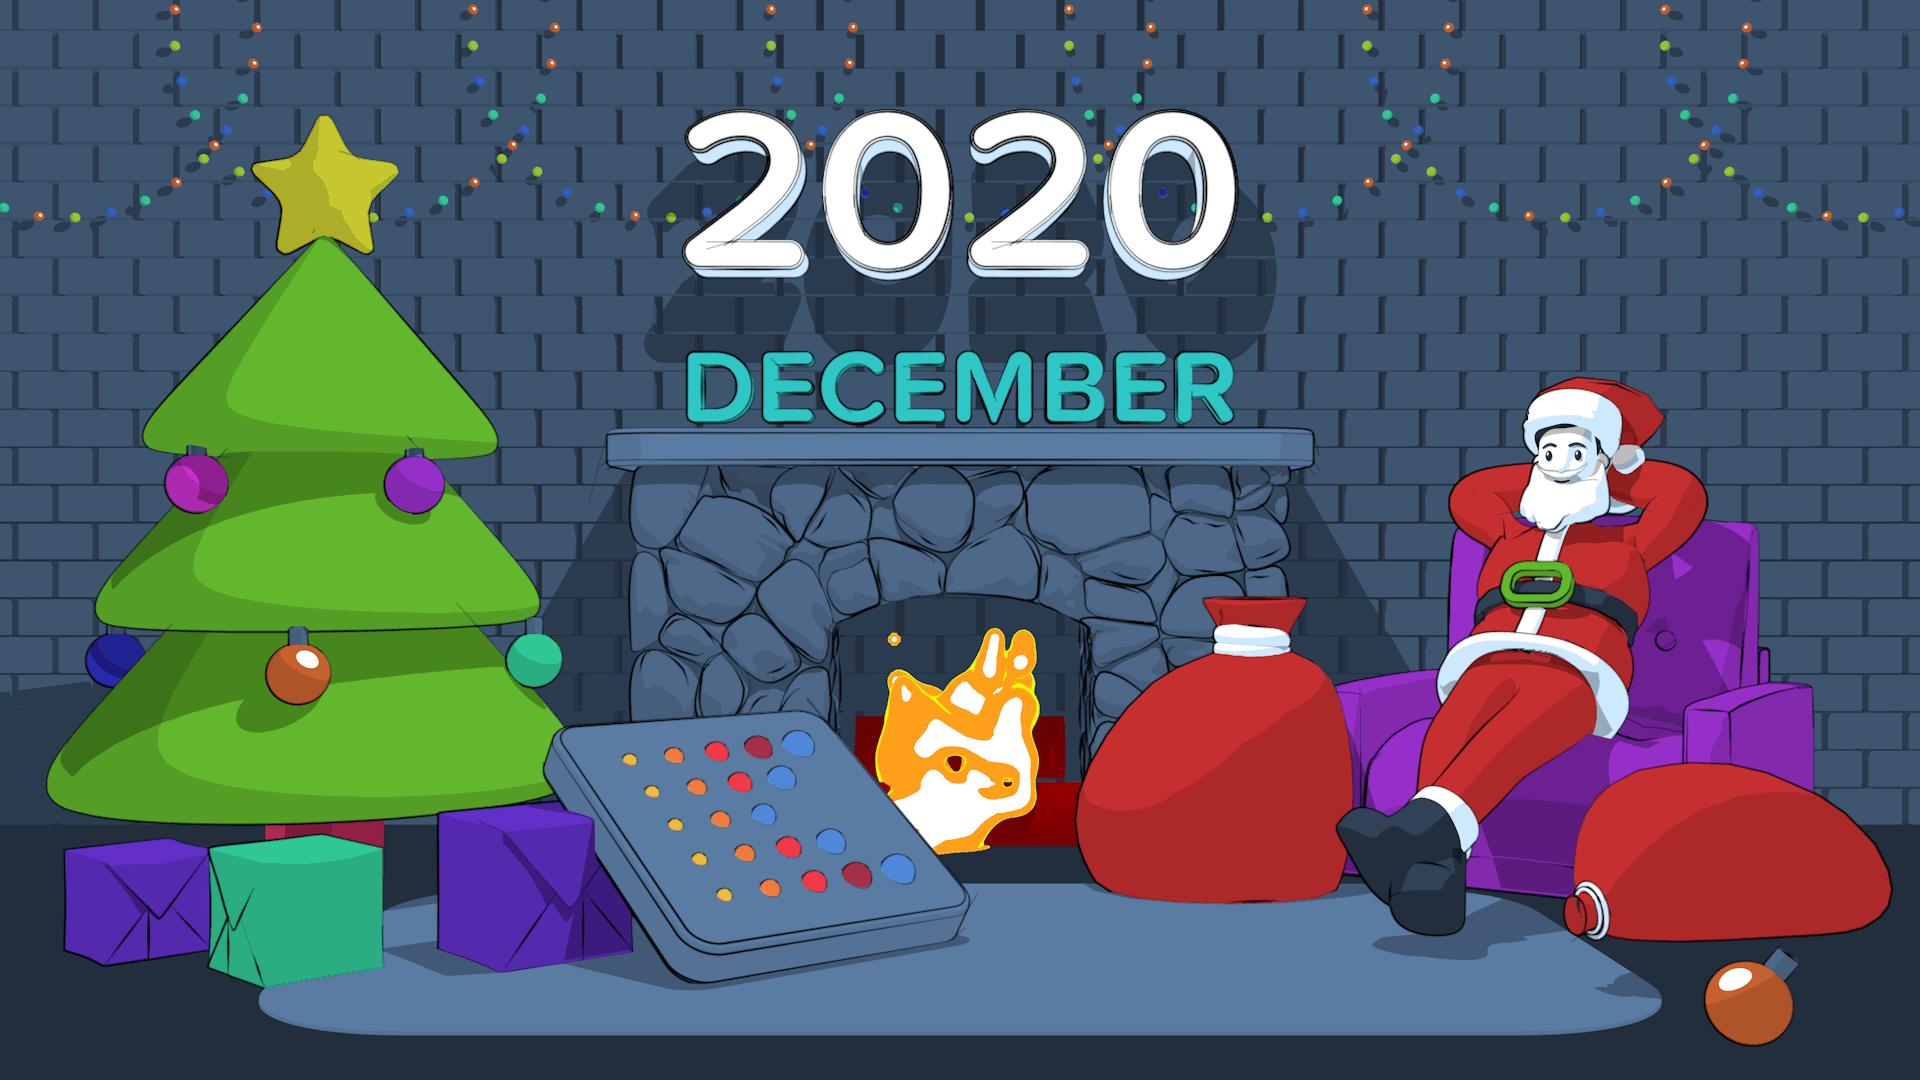 december-2020-new